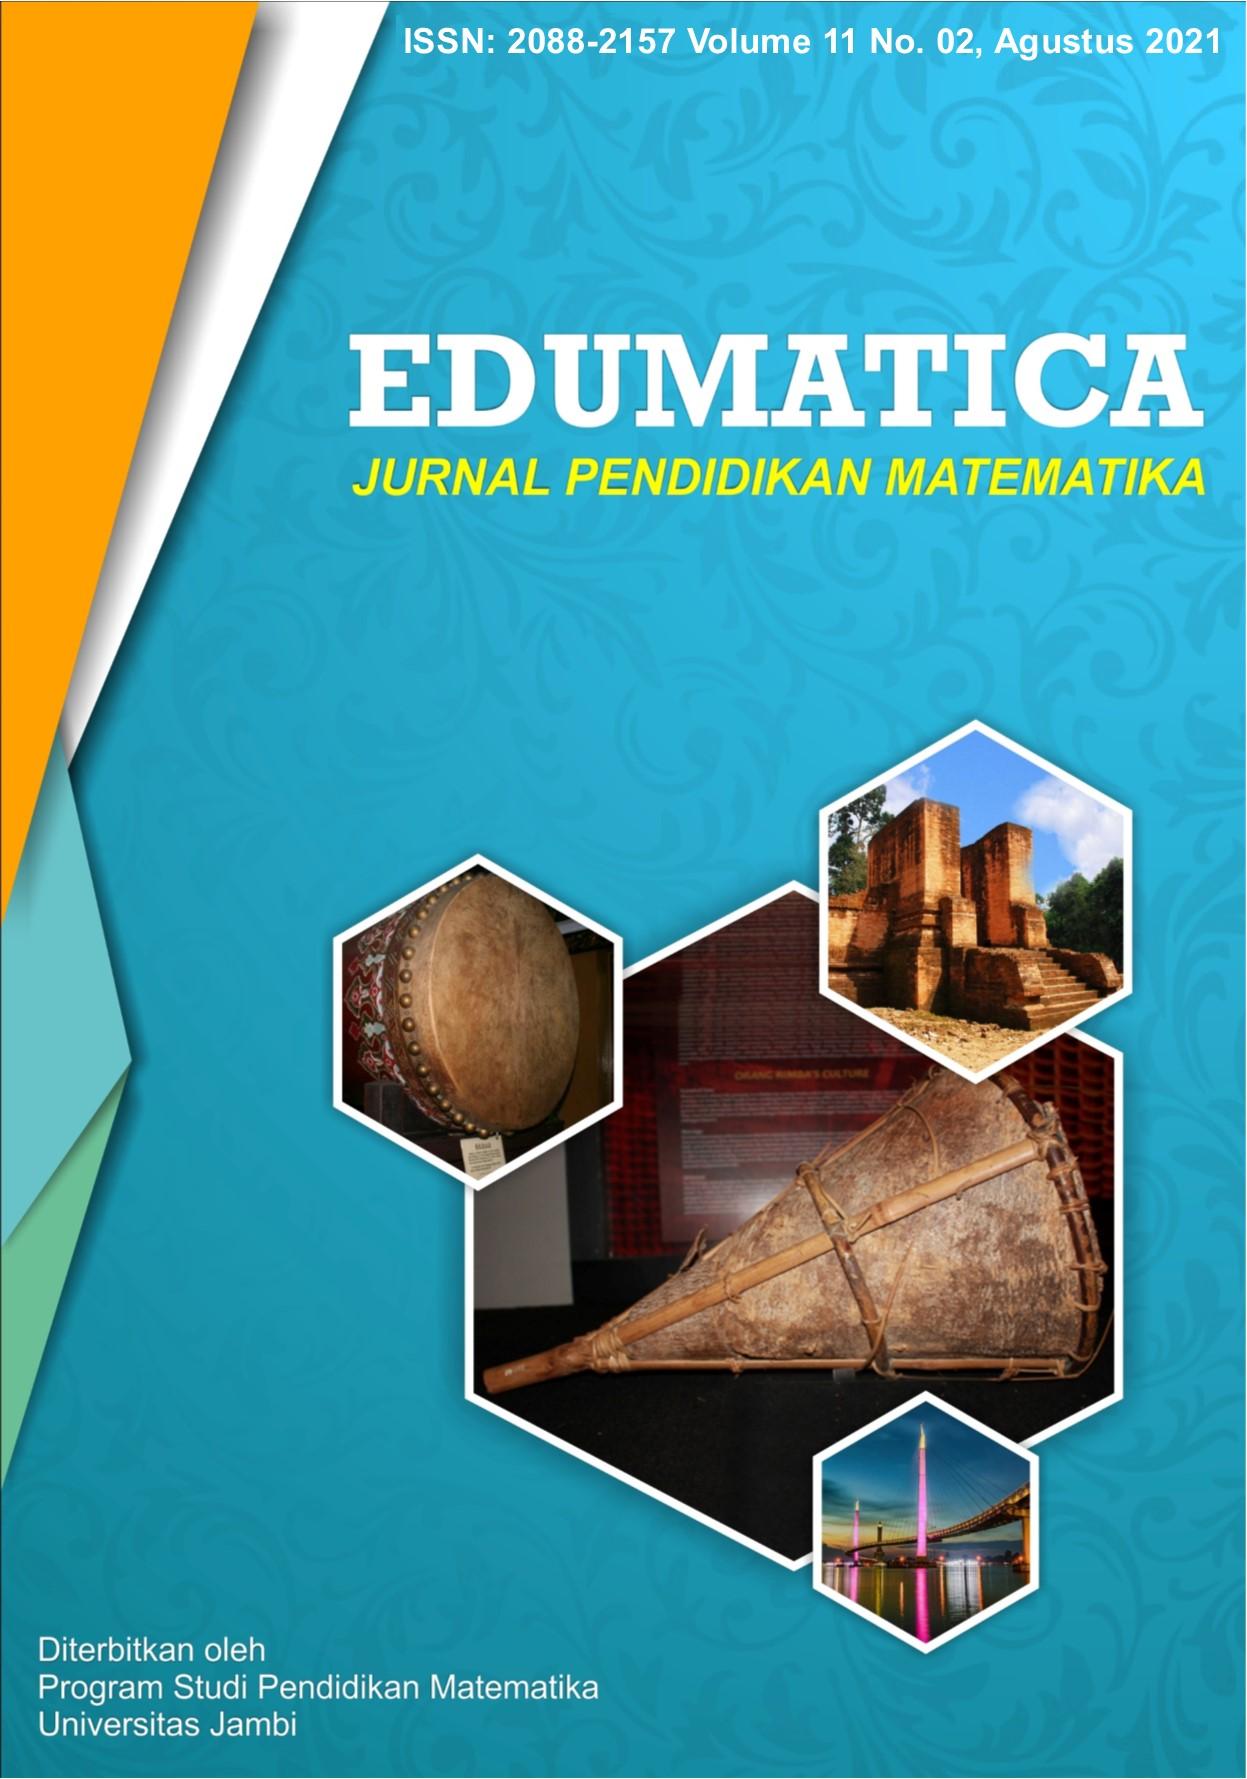 View Vol. 11 No. 02 (2021): Edumatica: Jurnal Pendidikan Matematika